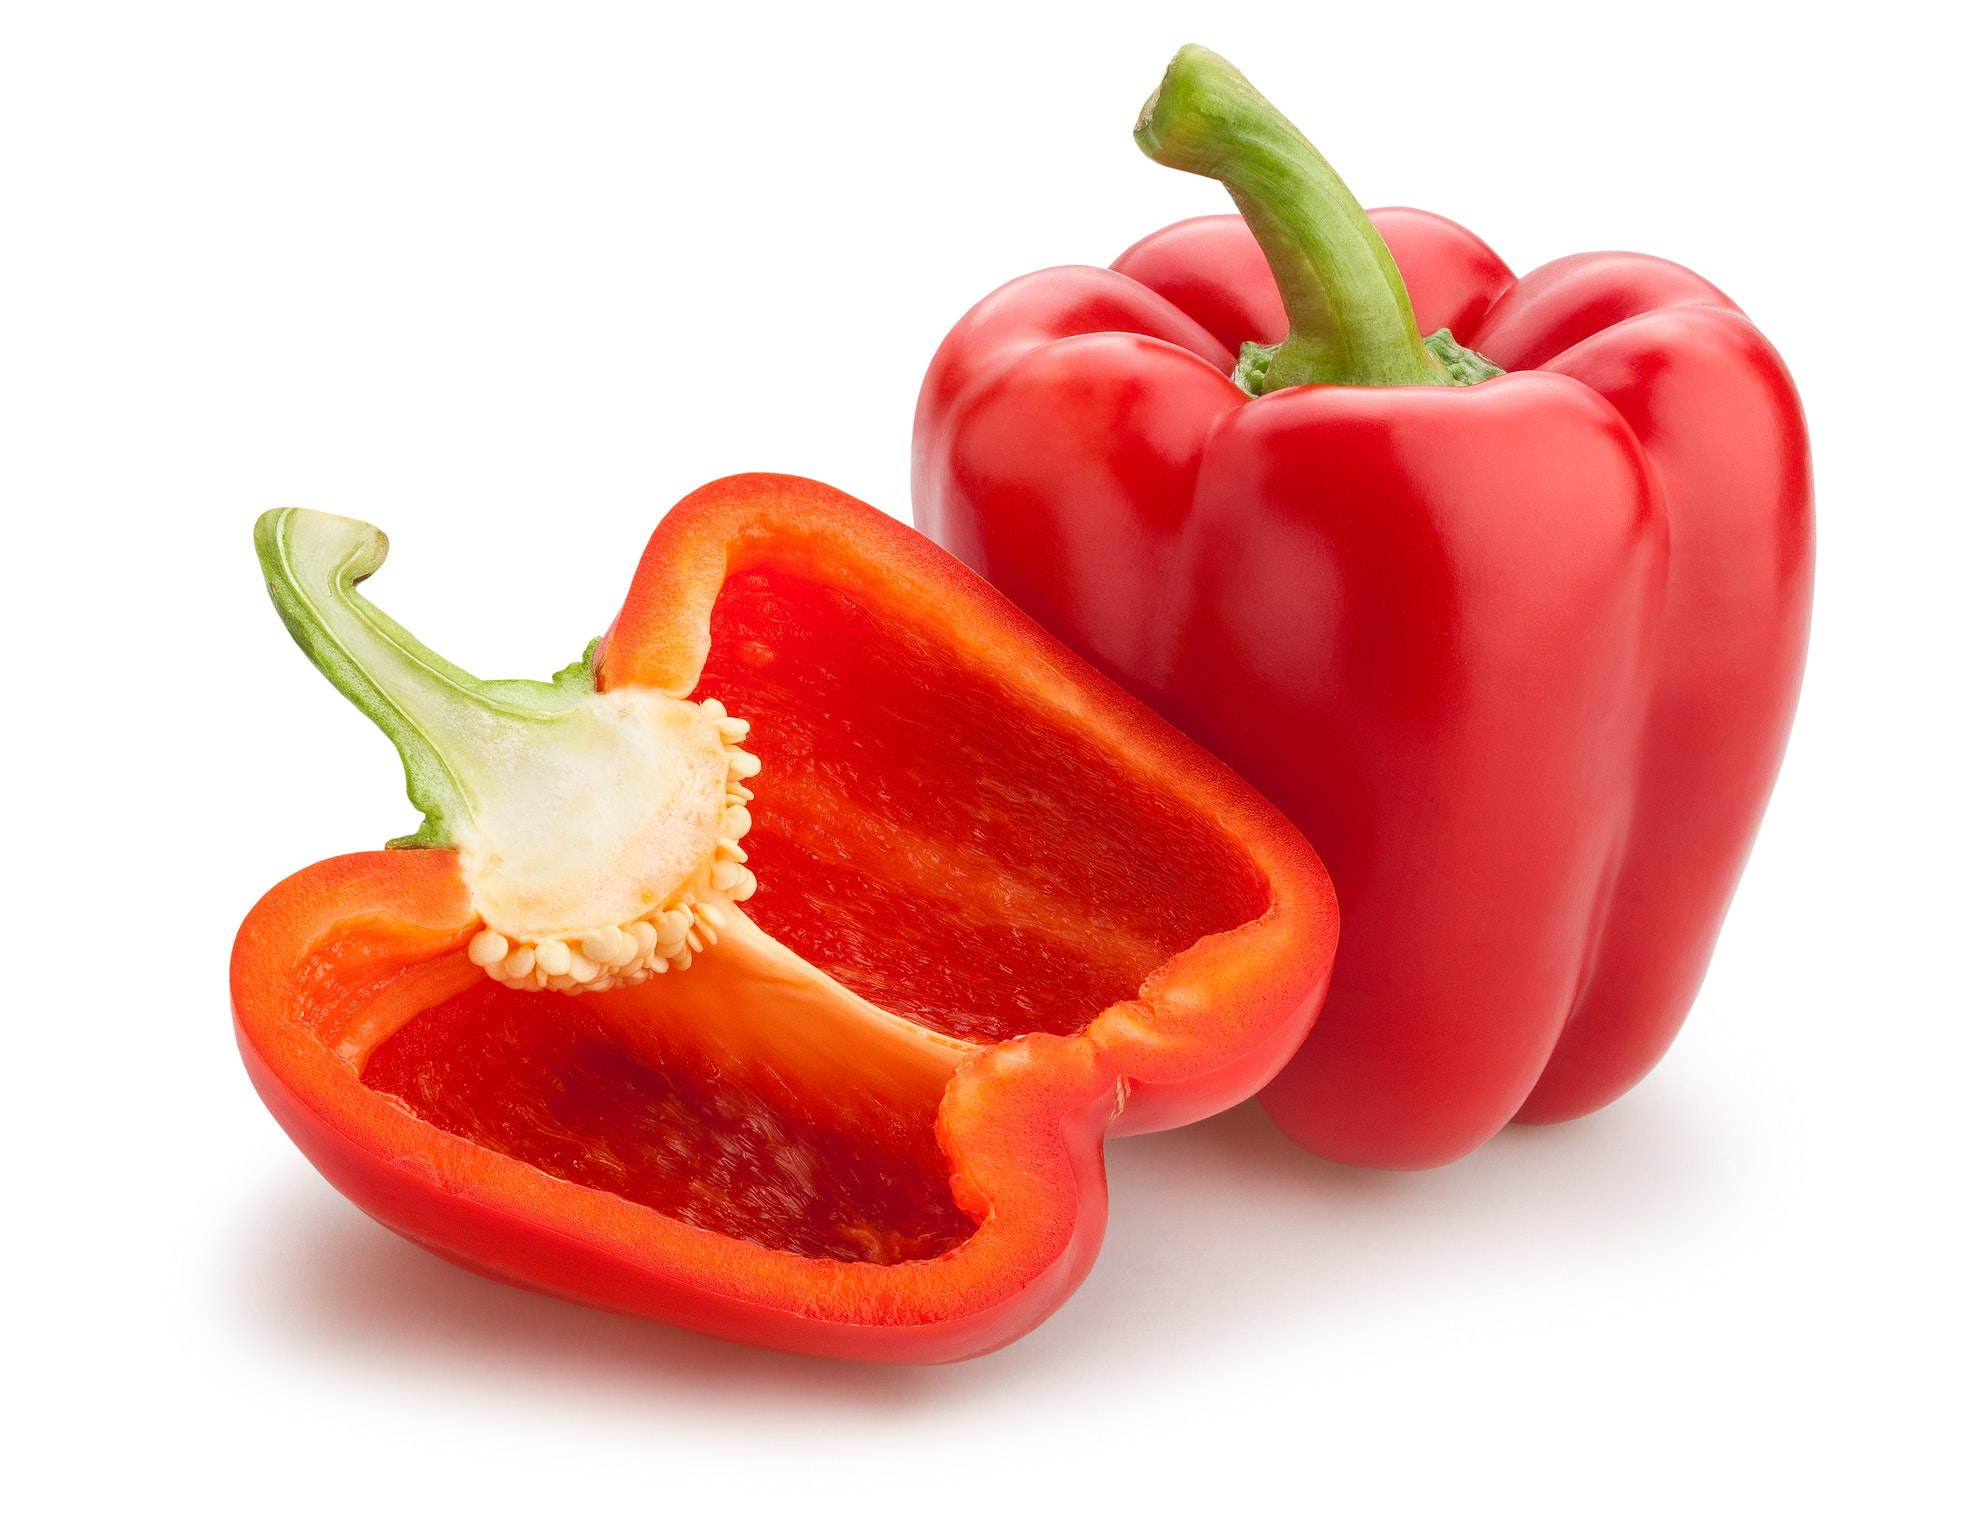 peberfrugt vitaminer